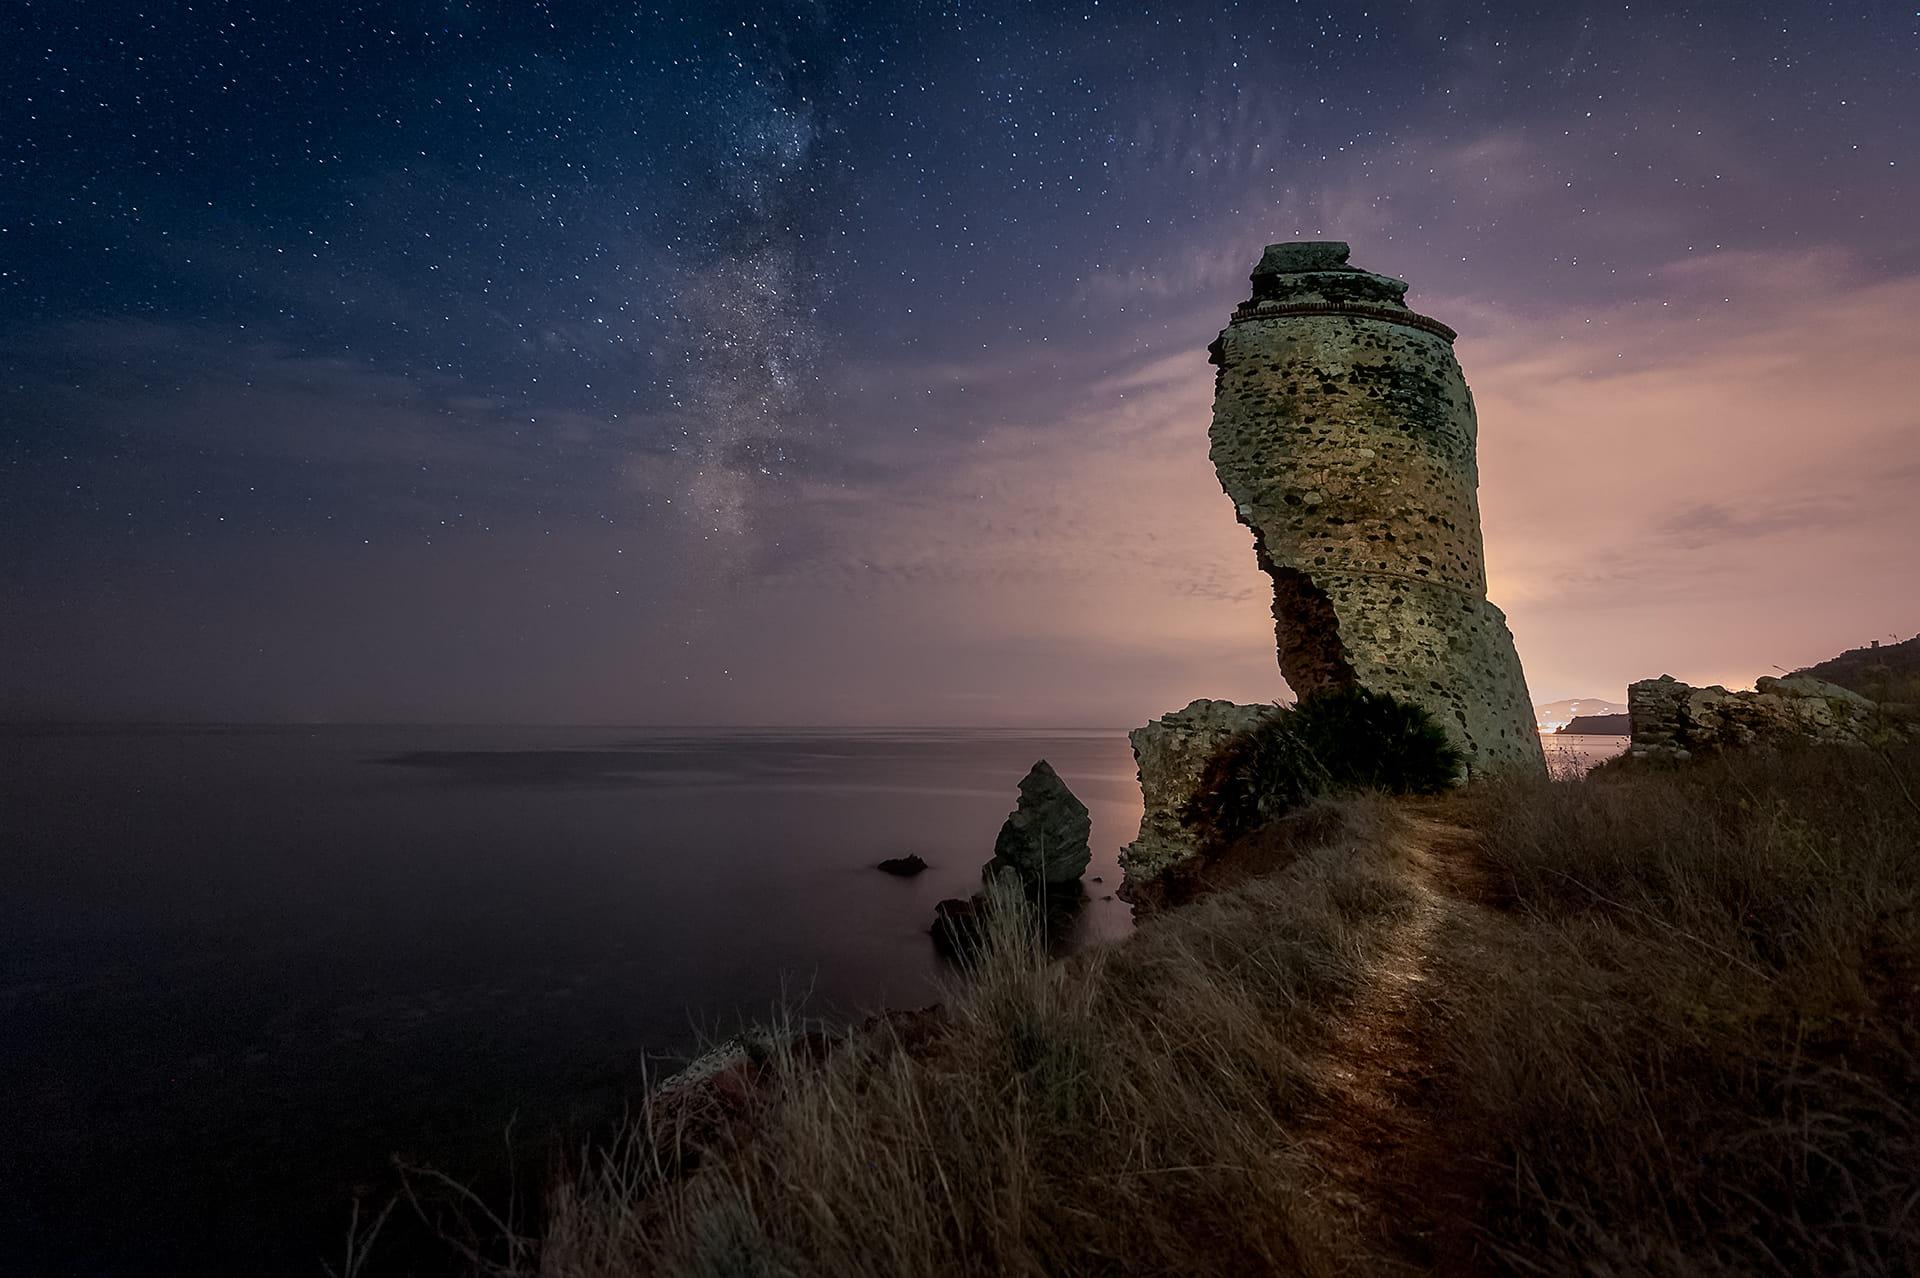 La vieja torre